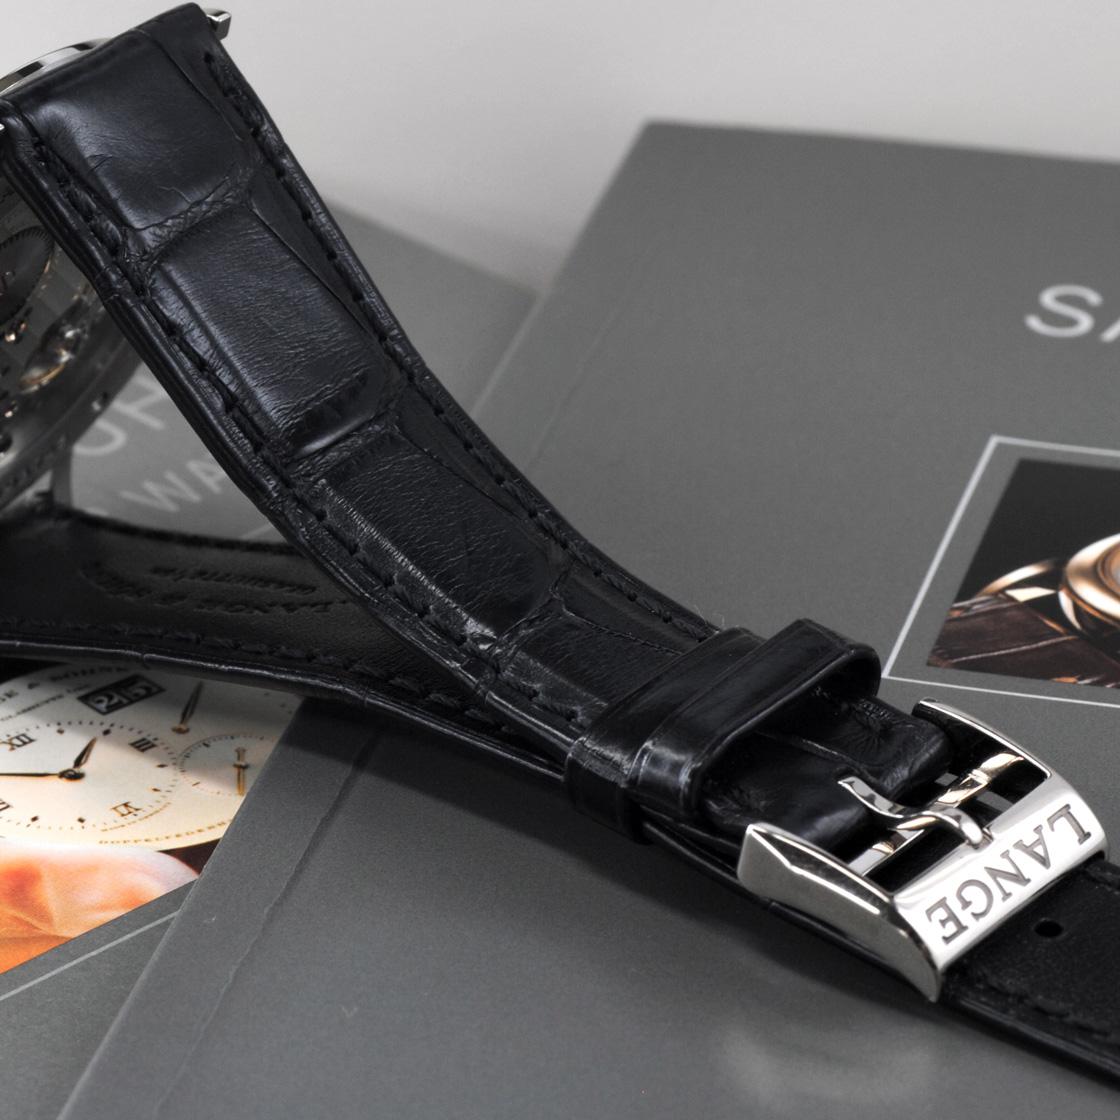 A.蘭格&zonesakusoniafurahha機械式手卷K18WG純金/皮革銀子透明背211.026/LS2113AJ